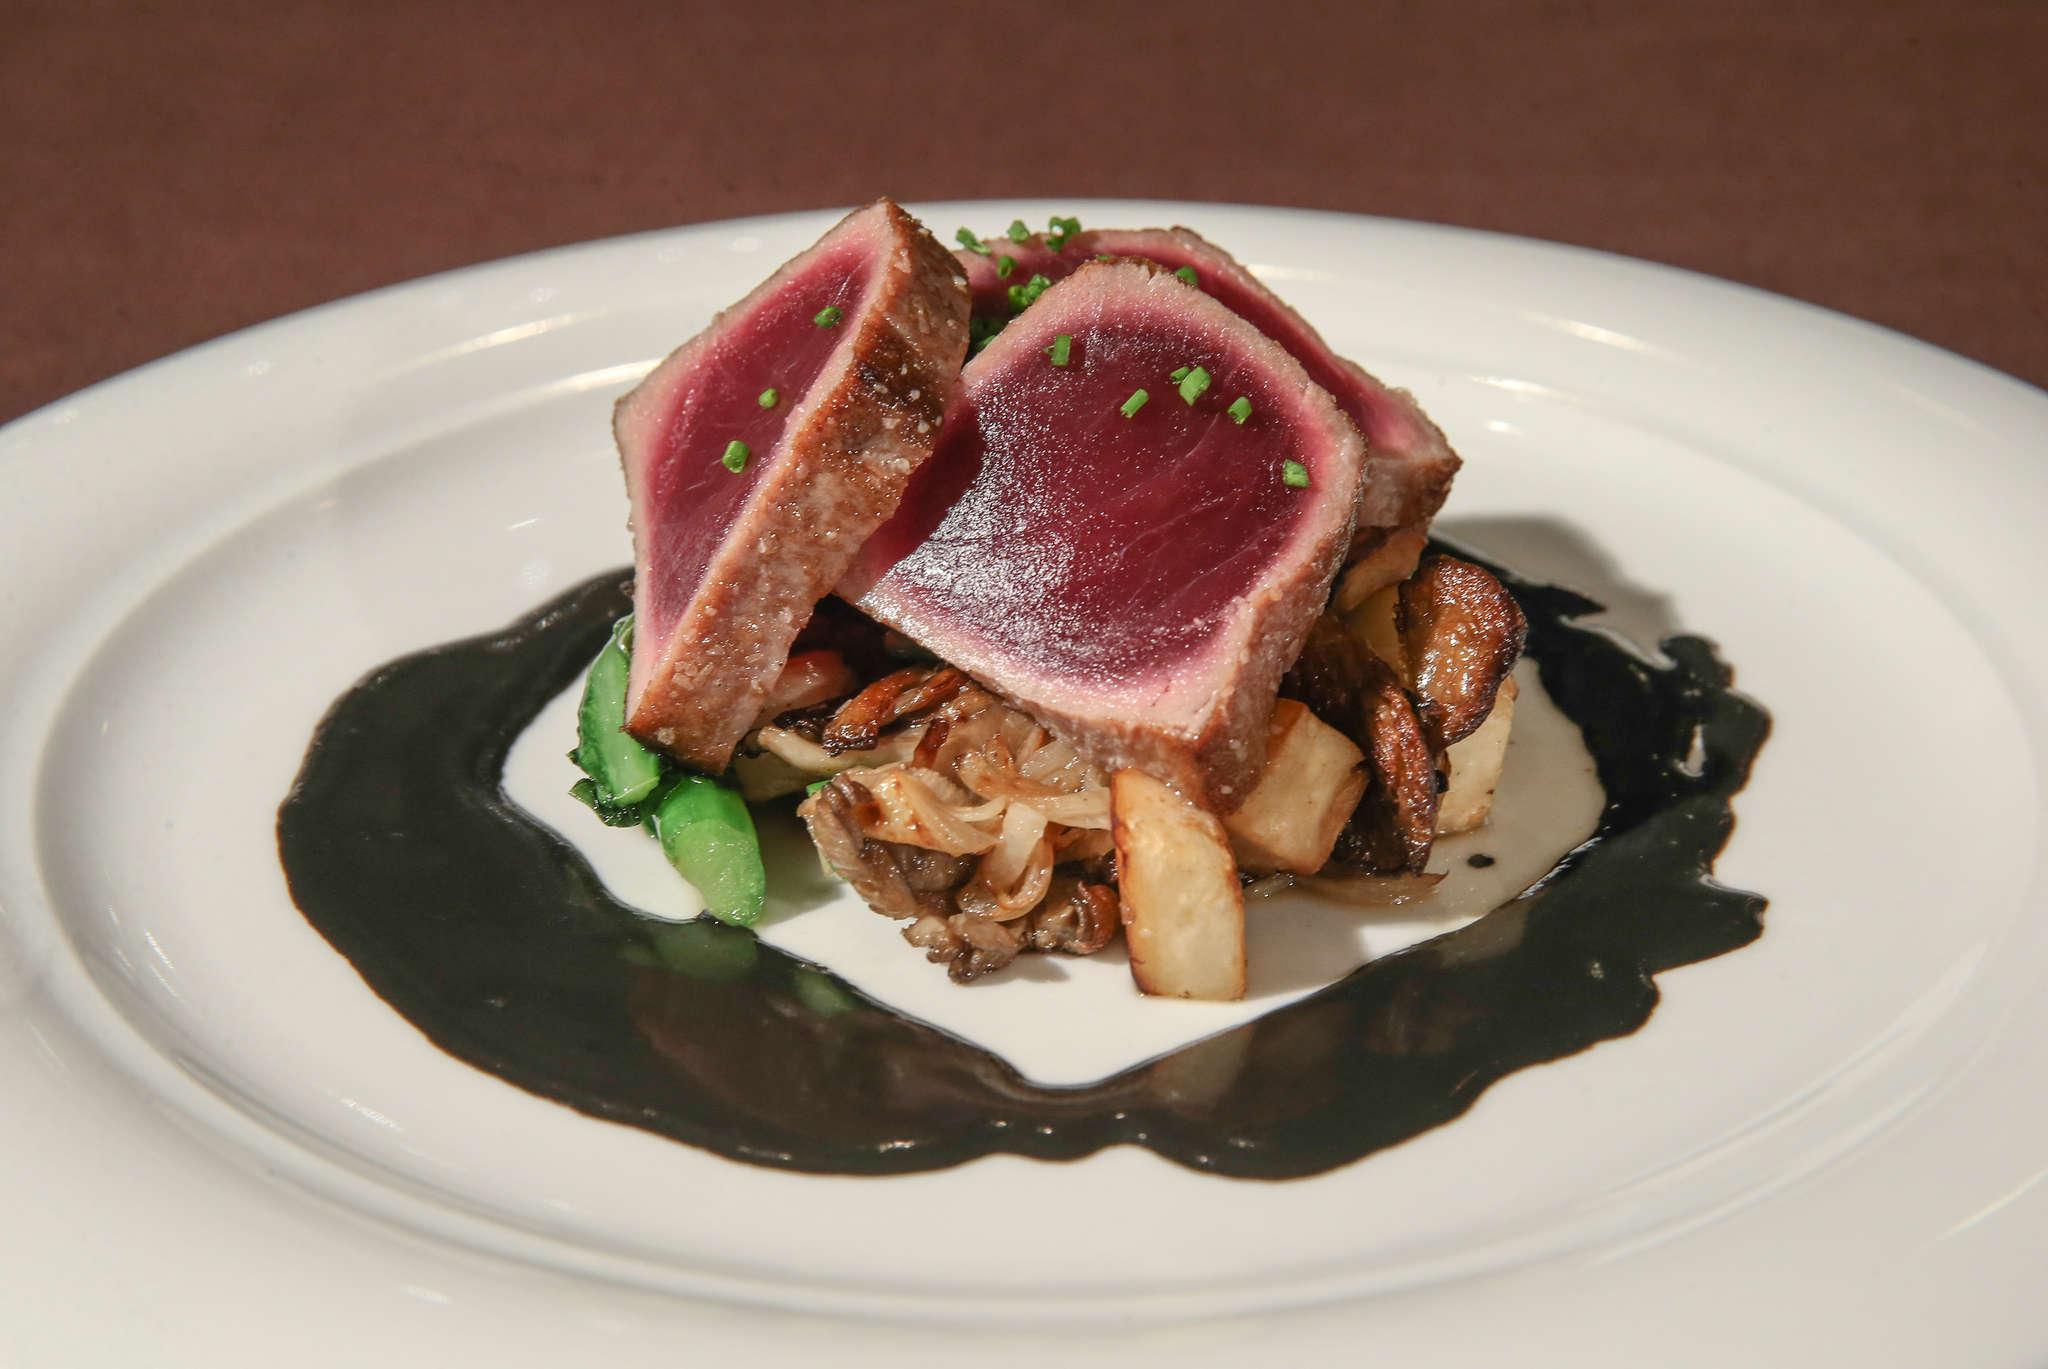 Tuna over black garlic at 26 North BYOB.